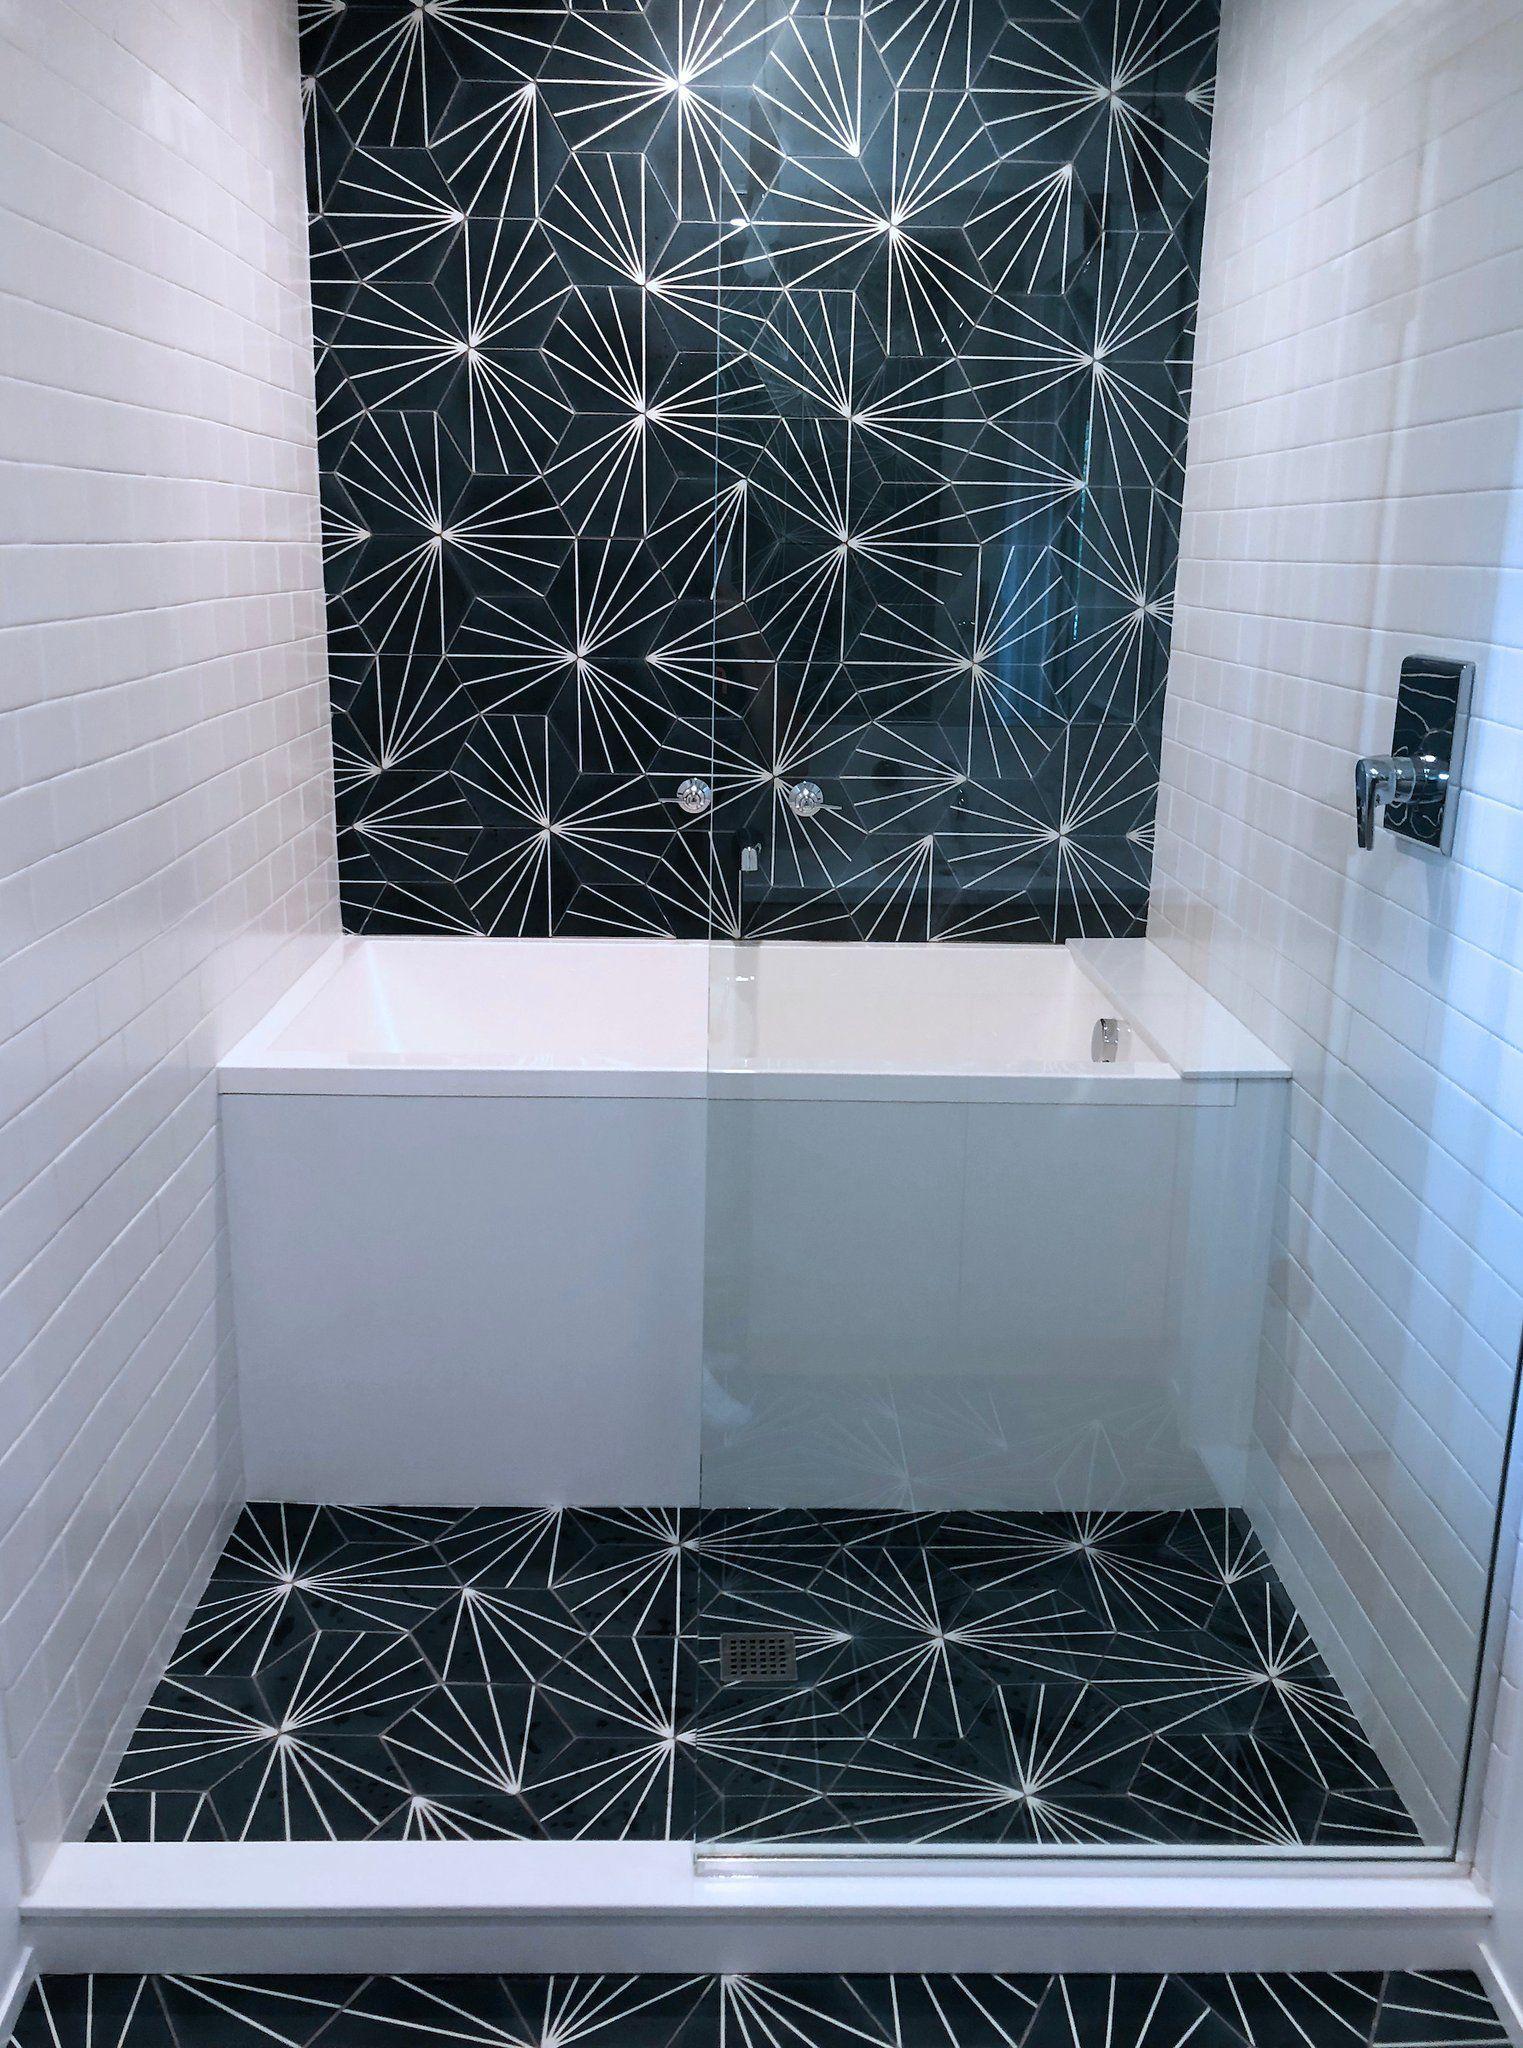 Cle Tile Encaustic Hexagon Cement Tile Linear Pattern Radar Bathroom Design Bathrooms Remodel Small Bathroom